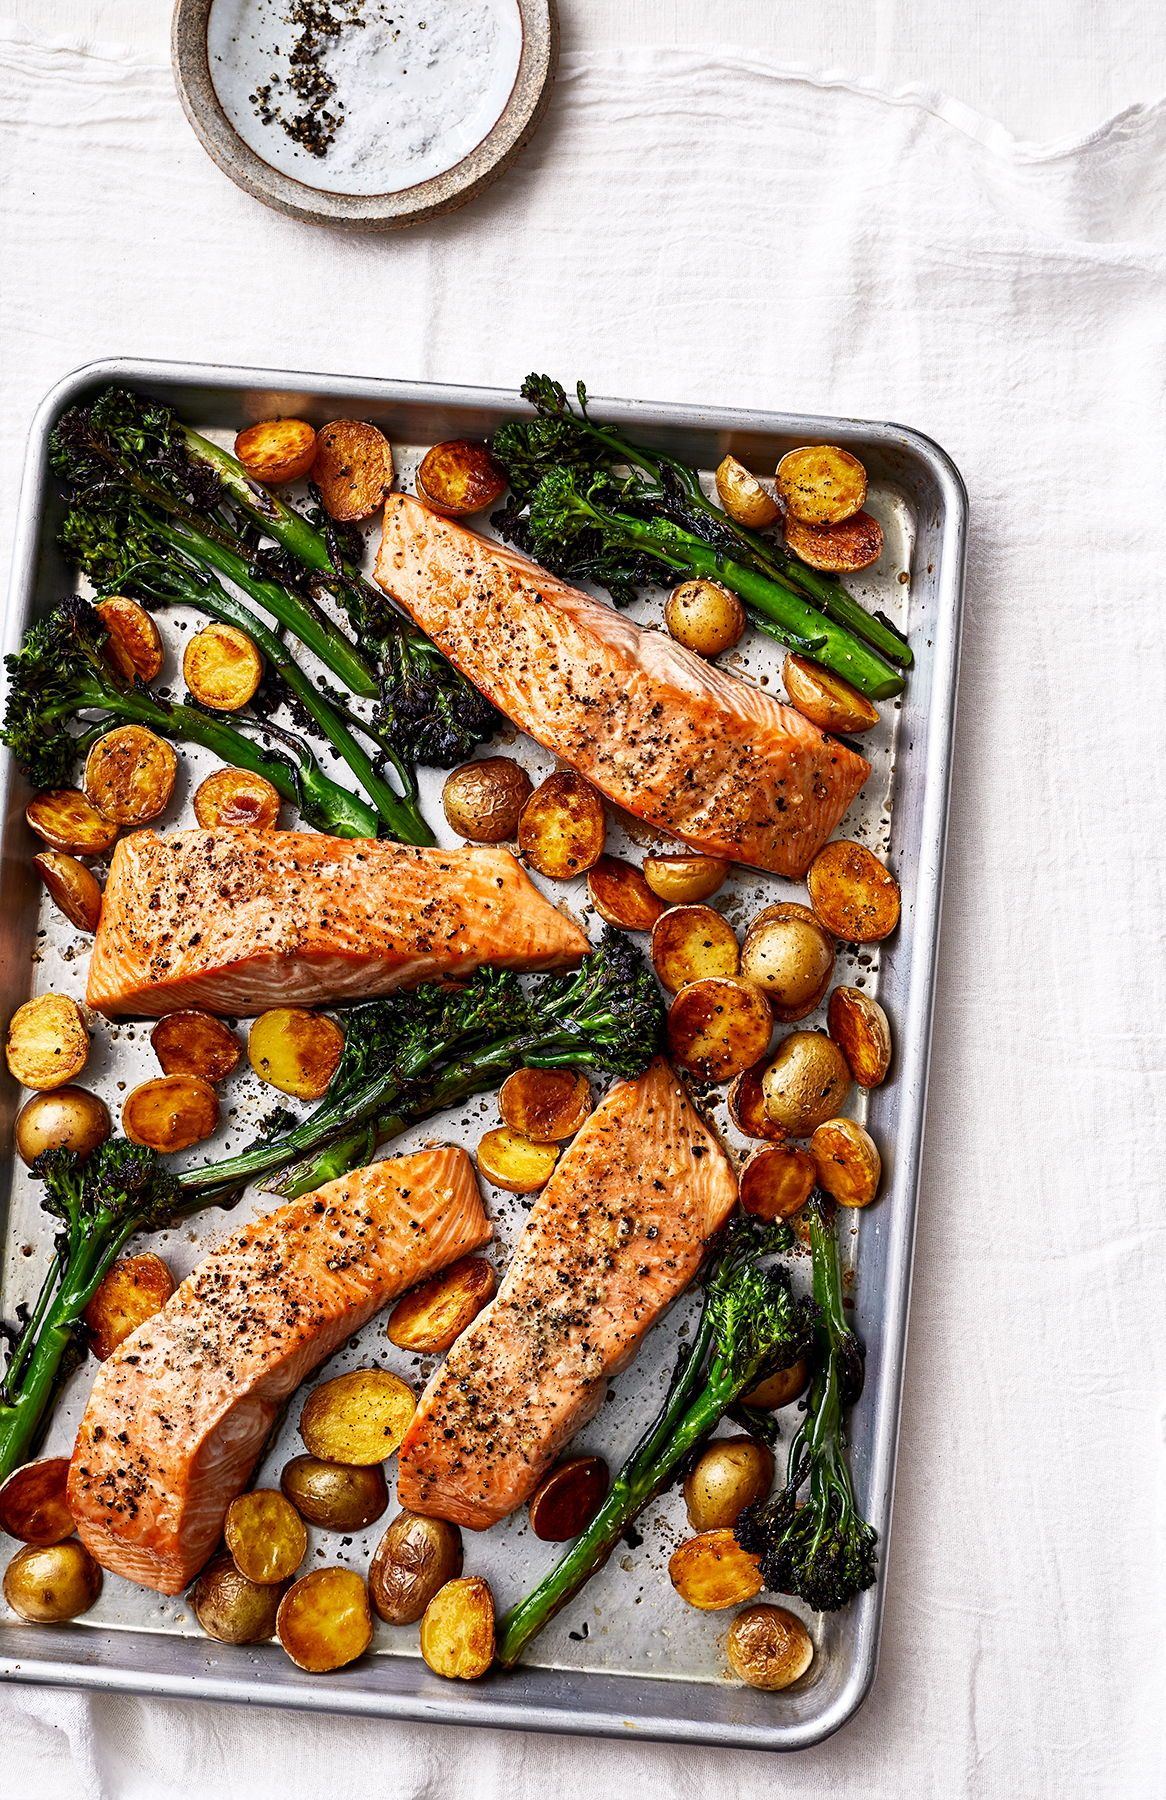 Sheet Pan Salmon With Potatoes and Broccolini